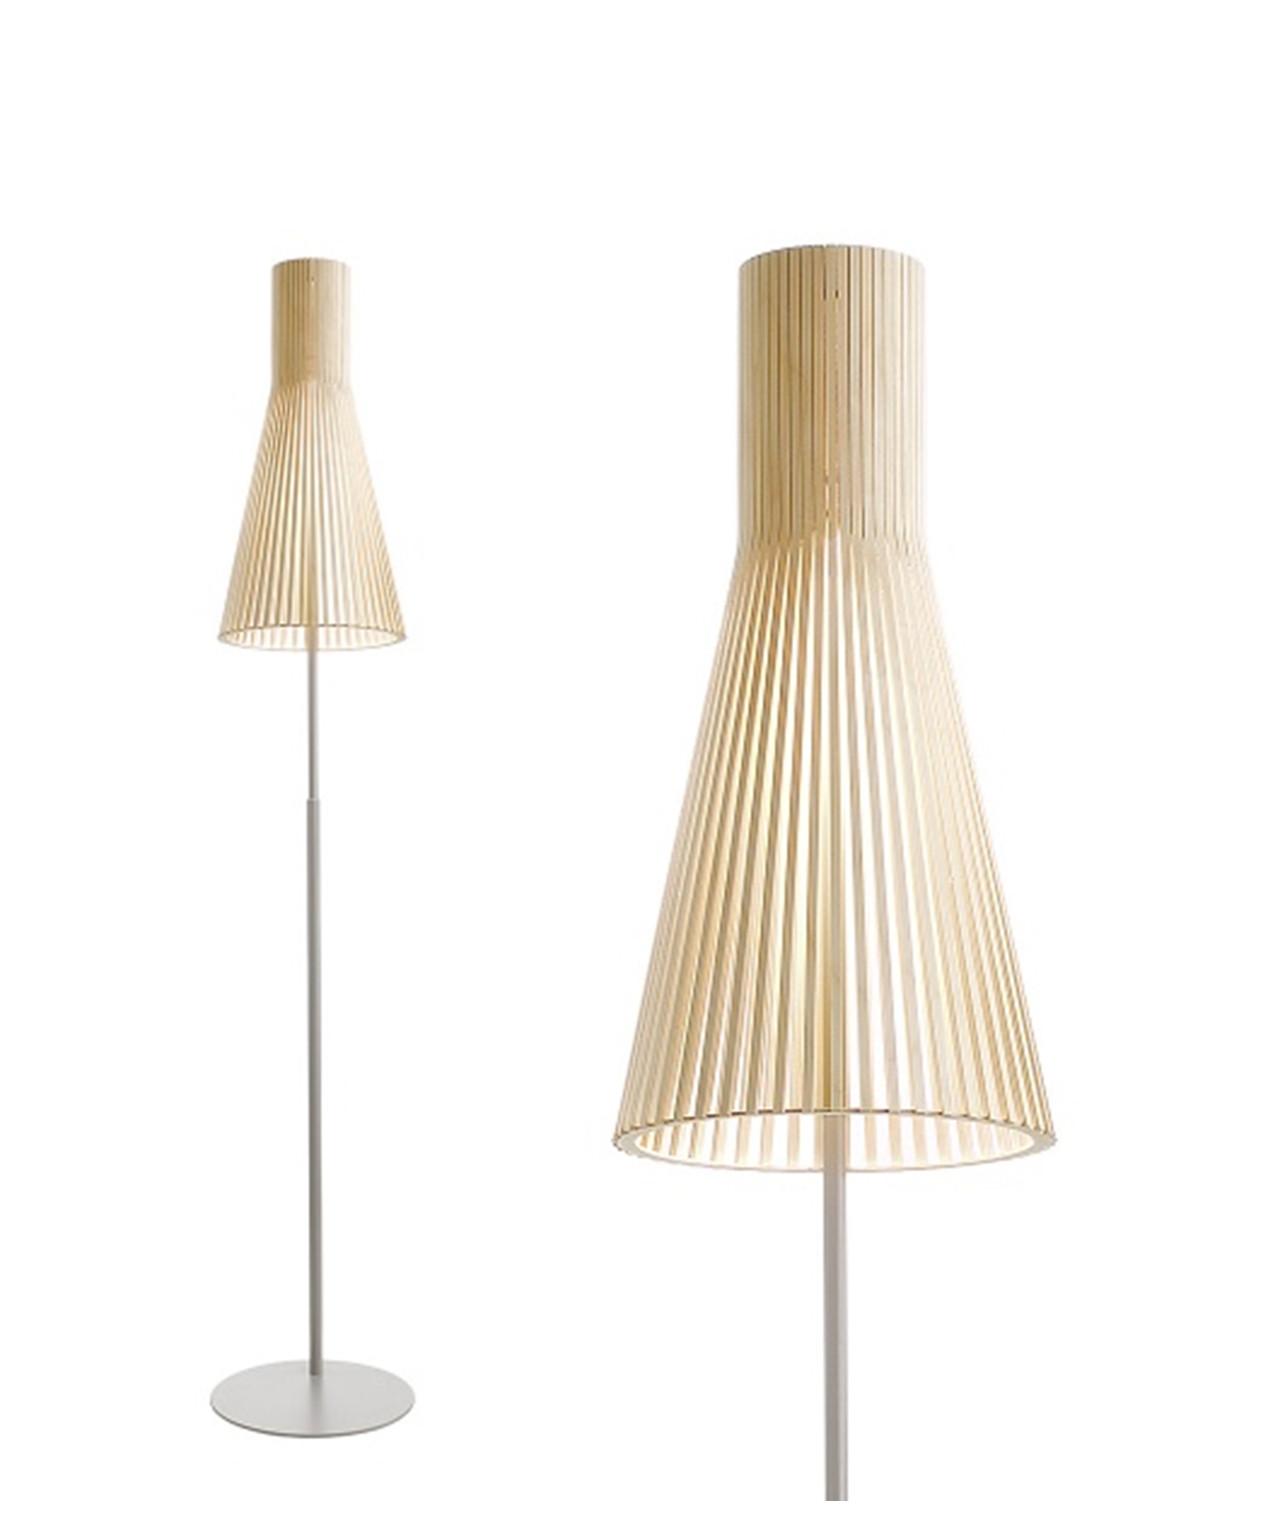 Secto 4210 stehleuchte birke secto for Design leuchten replica